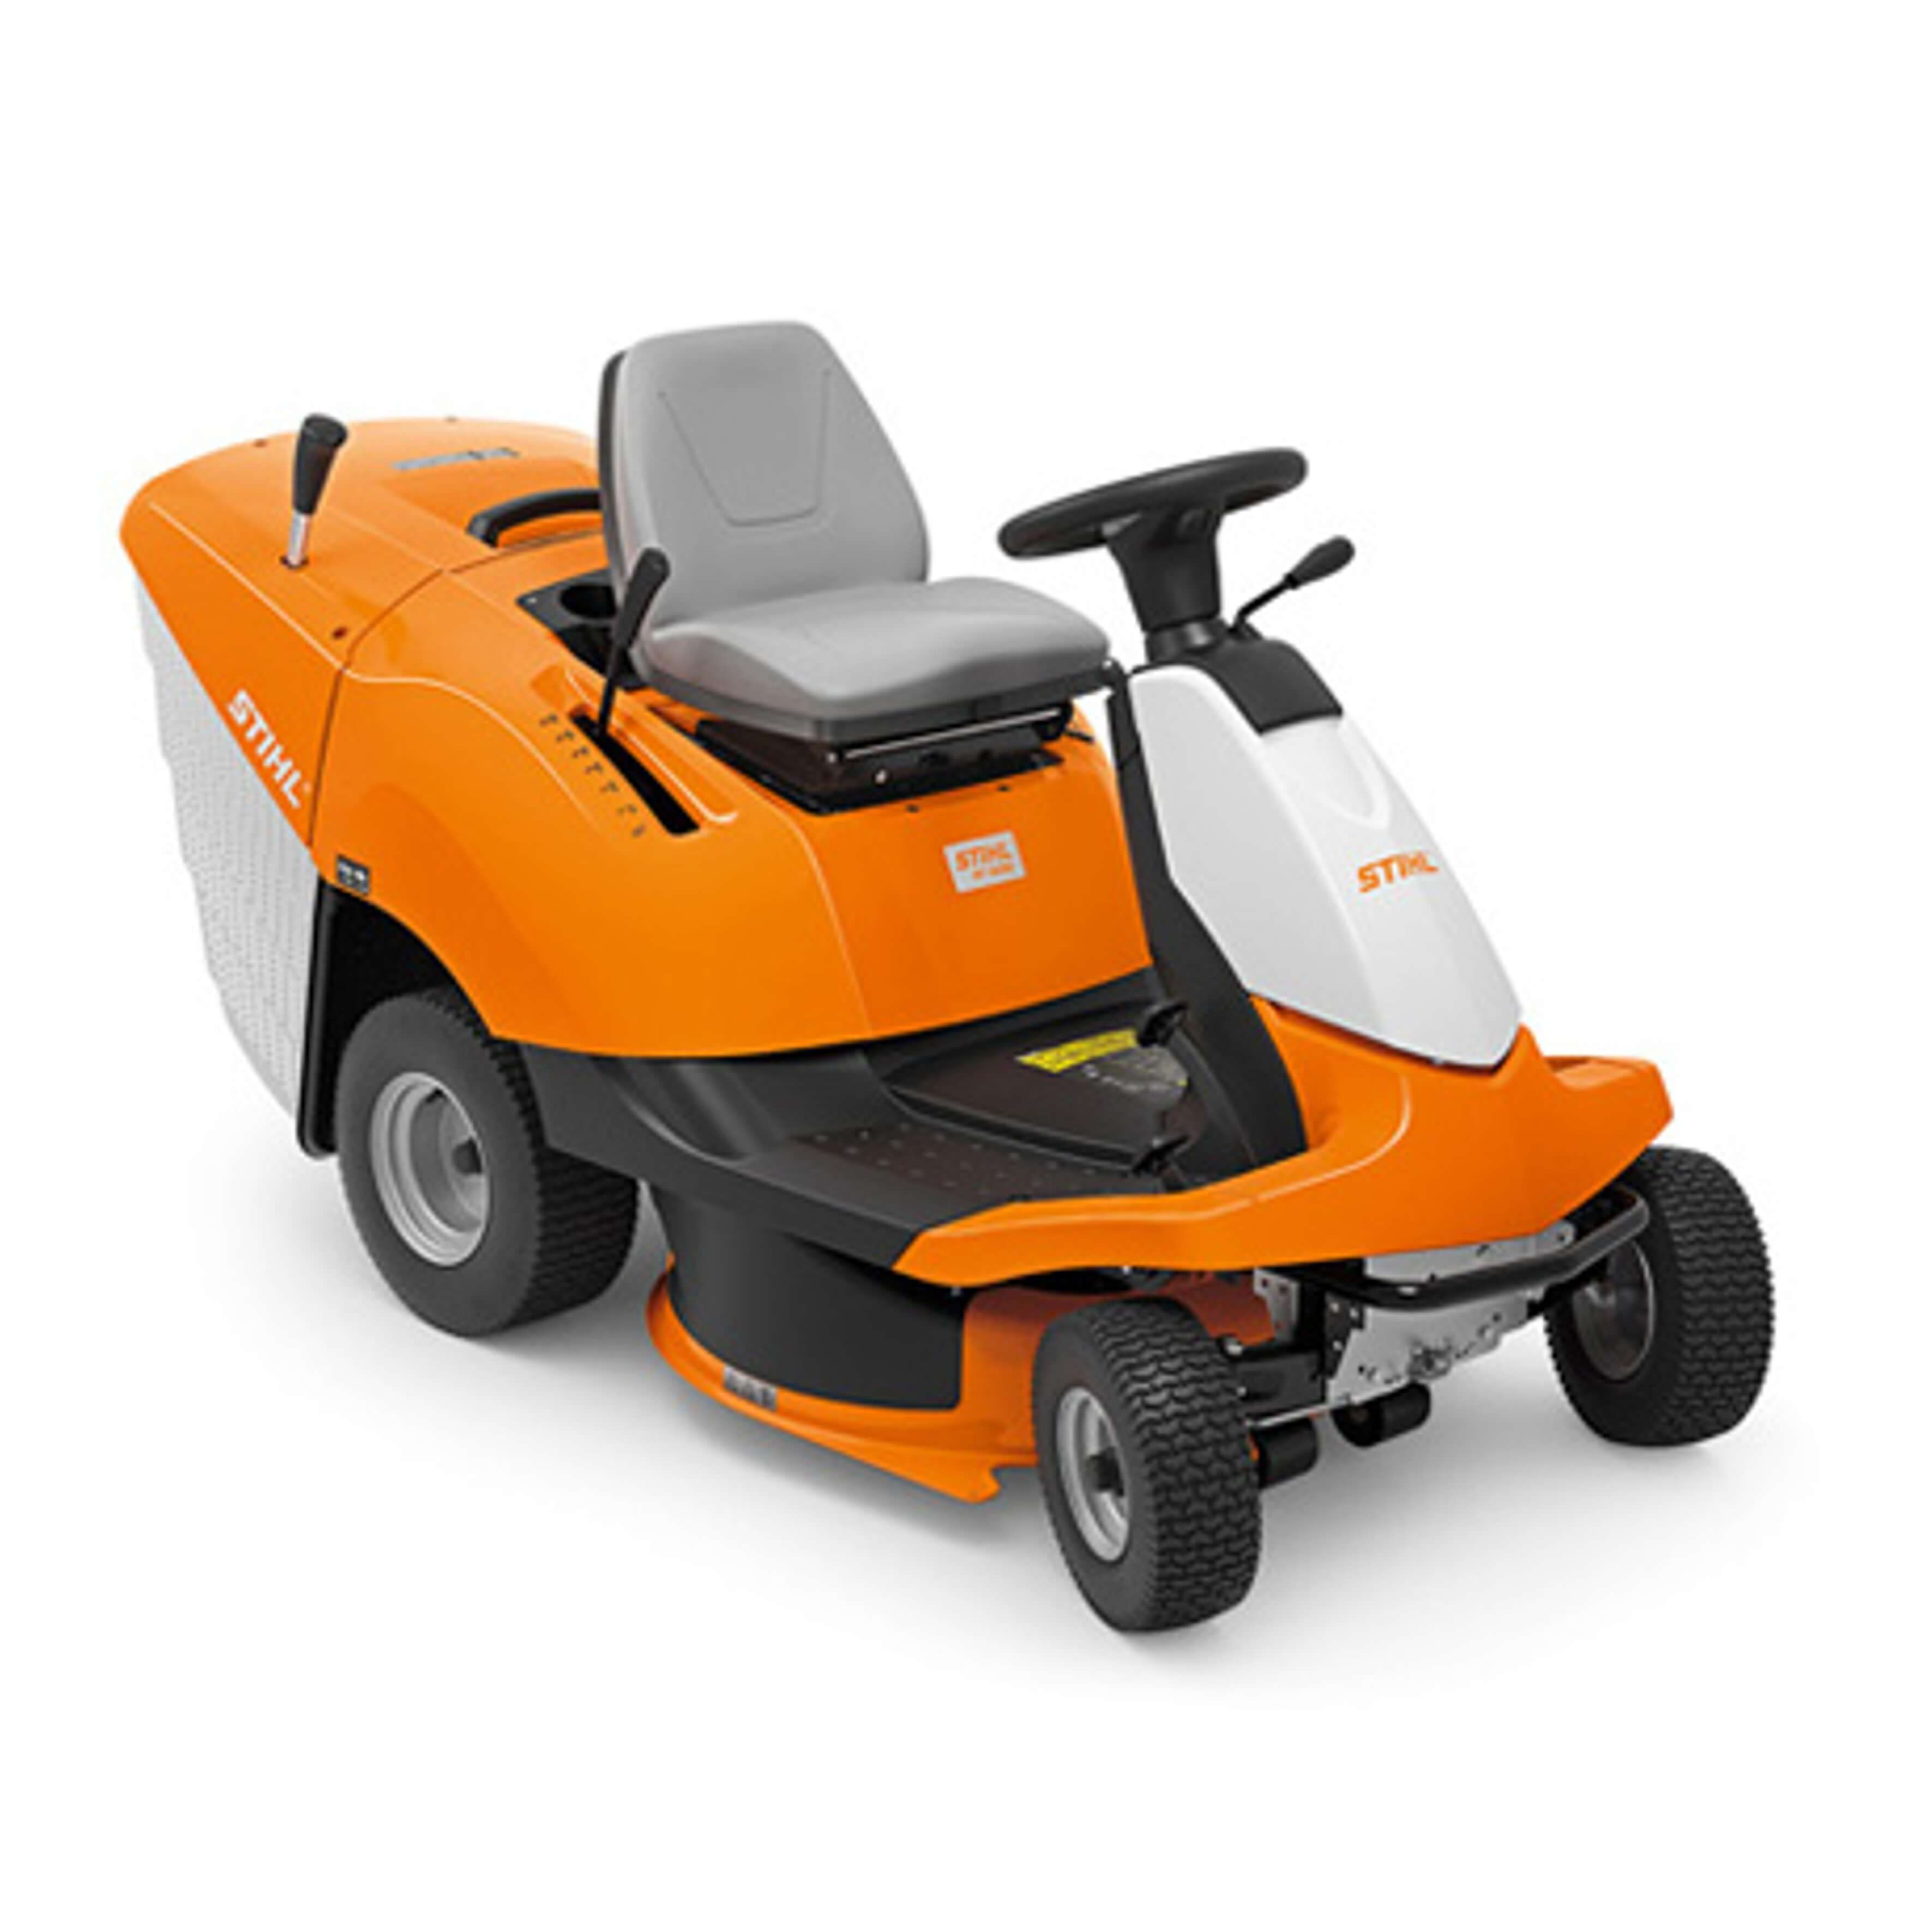 Stihl RT 4082.0 Ride on Mower Parts